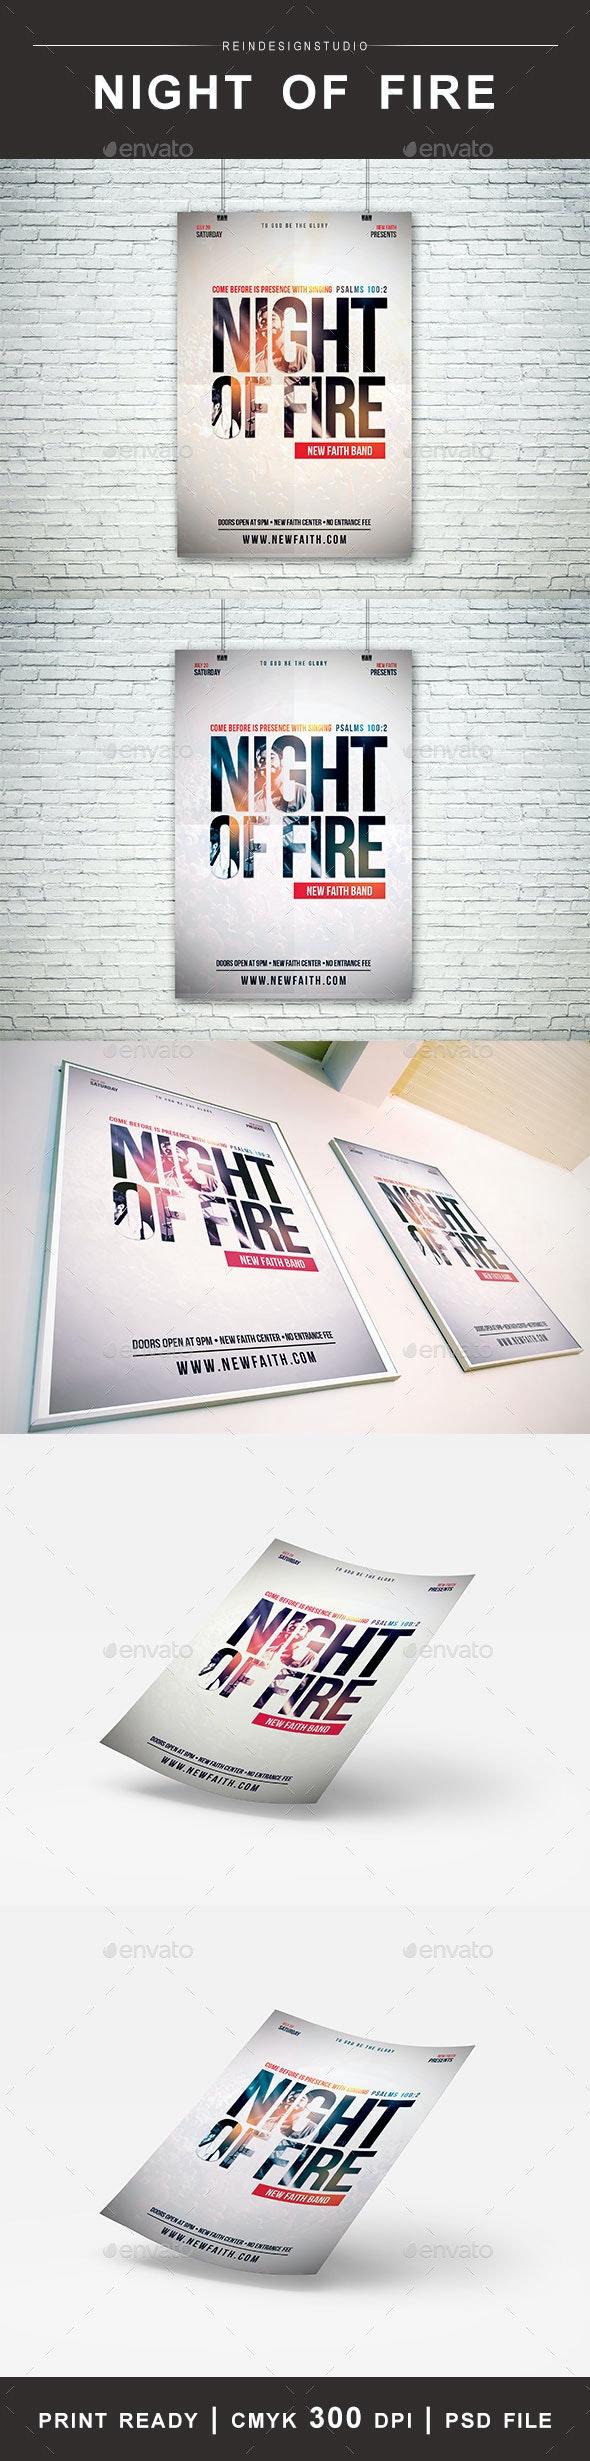 Night of Fire Church Flyer - Church Flyers